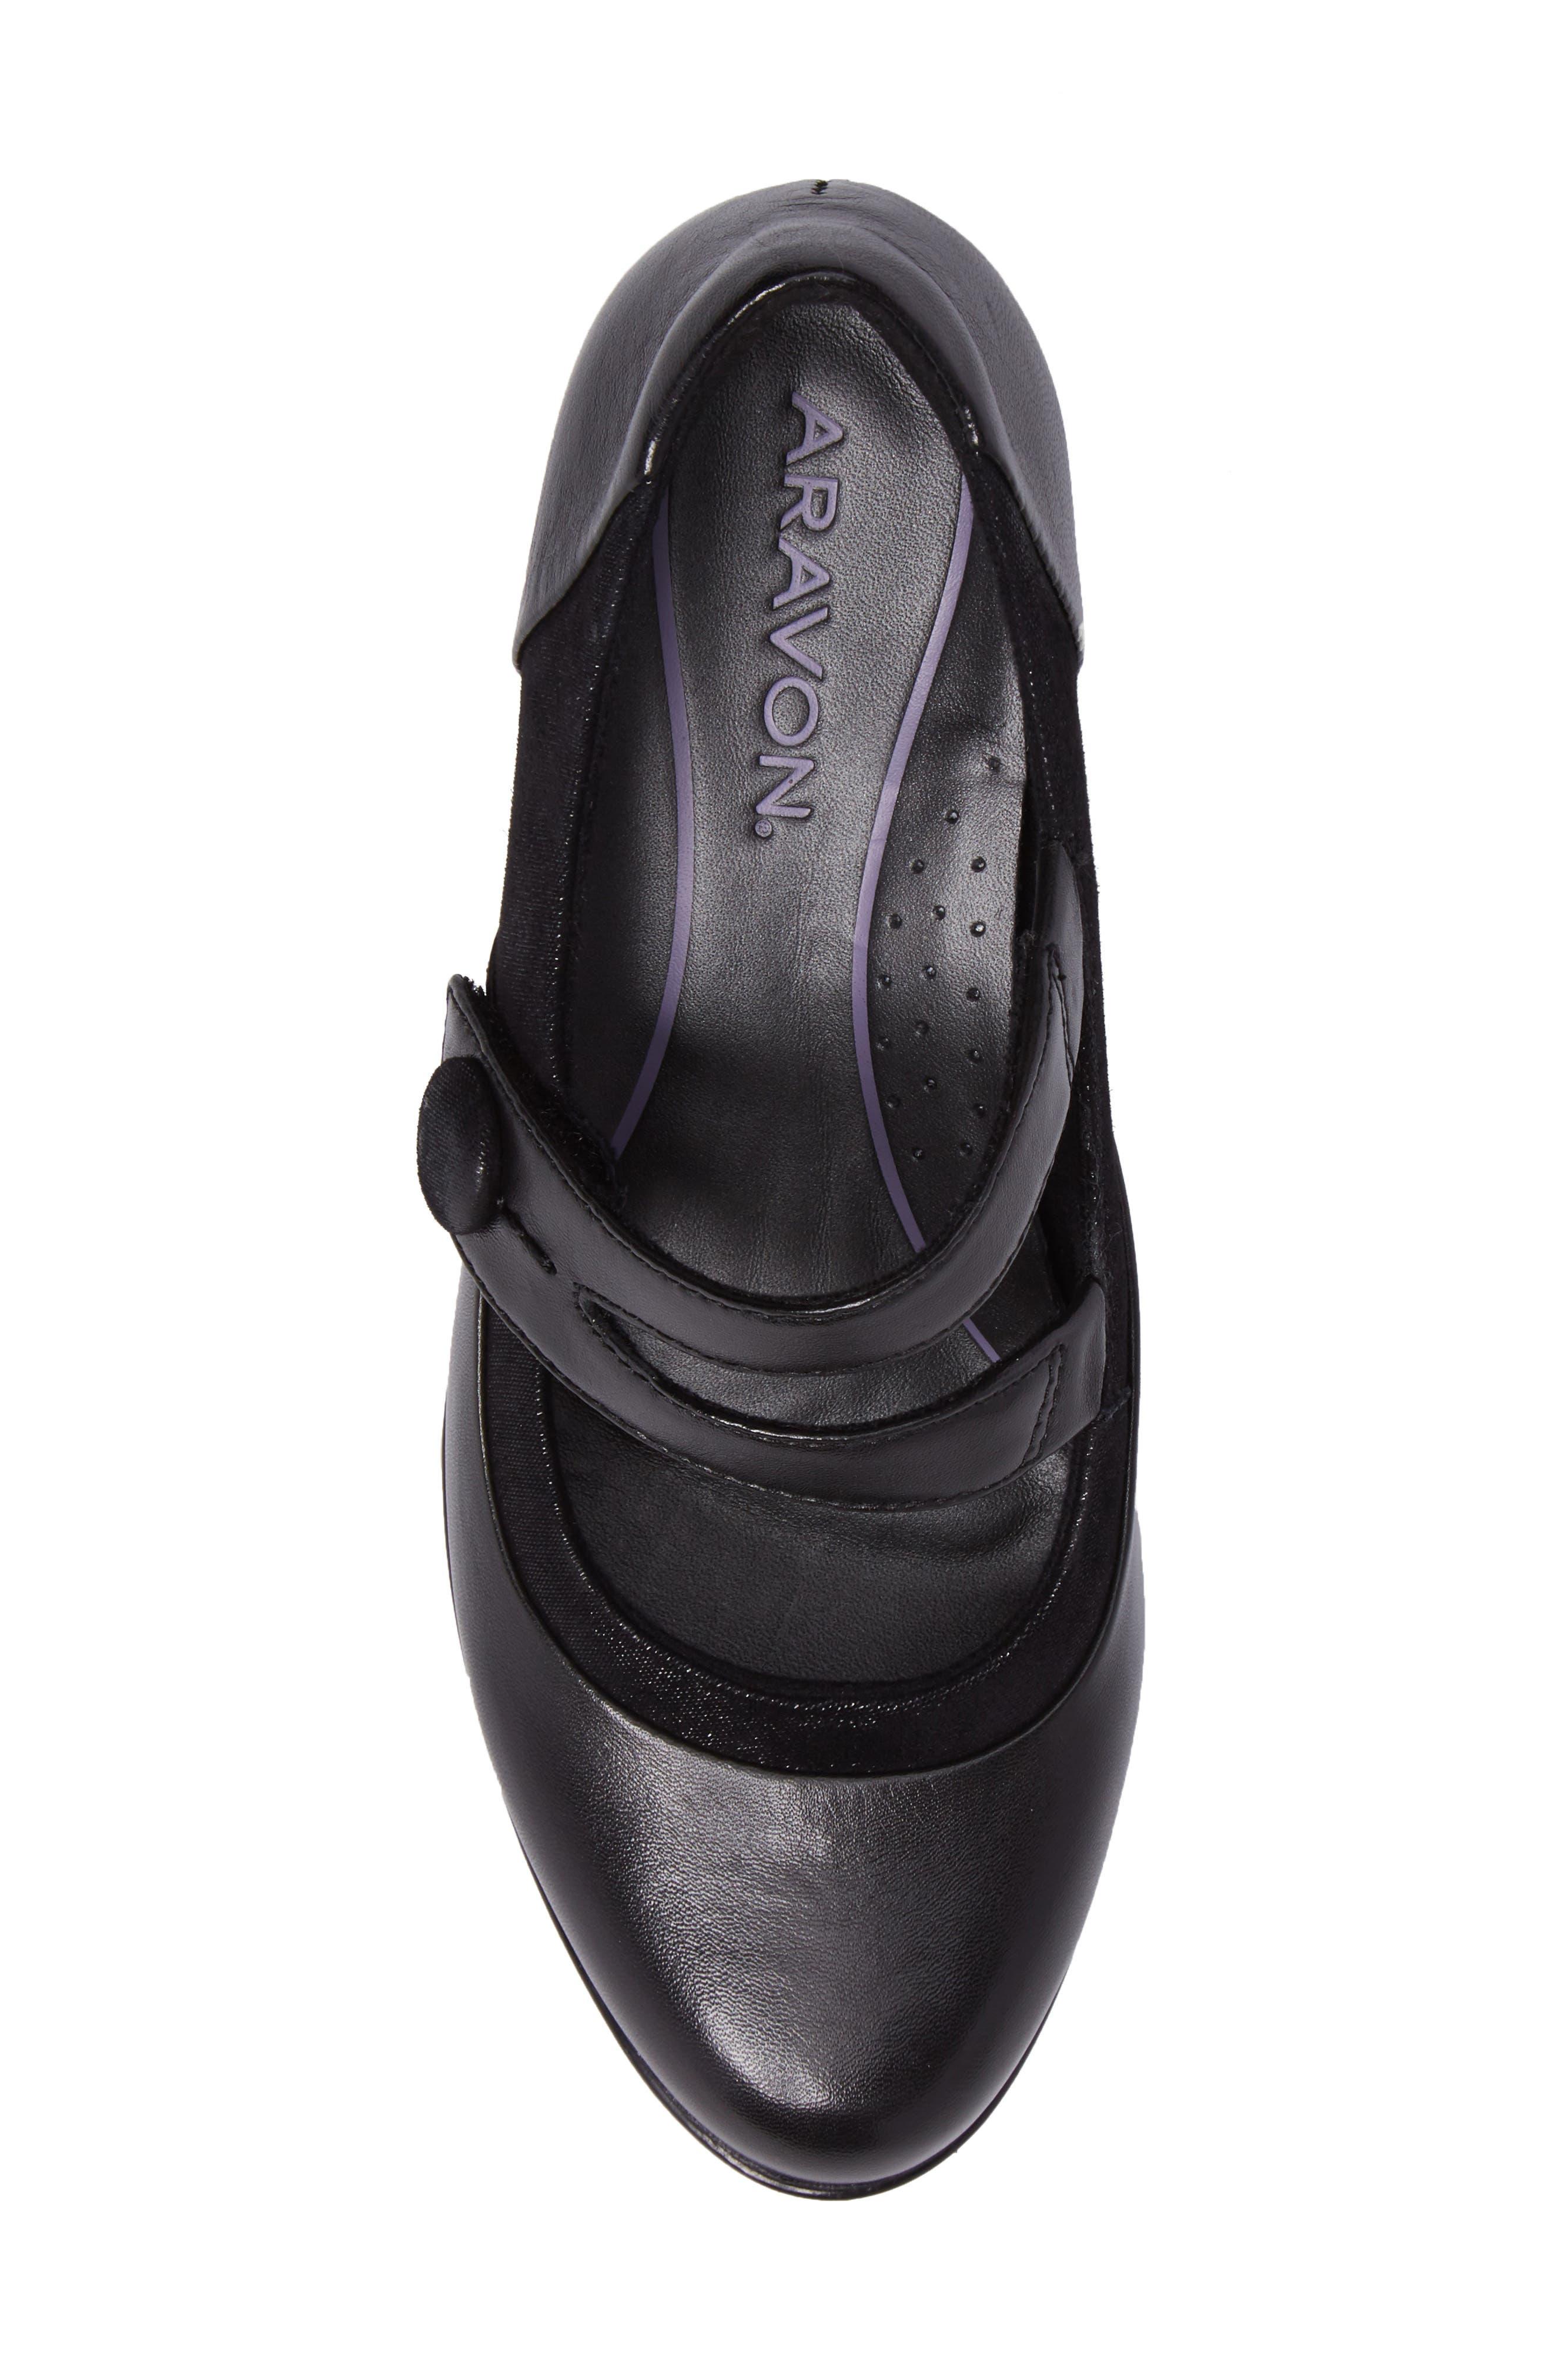 Lexee Mary Jane Pump,                             Alternate thumbnail 5, color,                             Black Leather